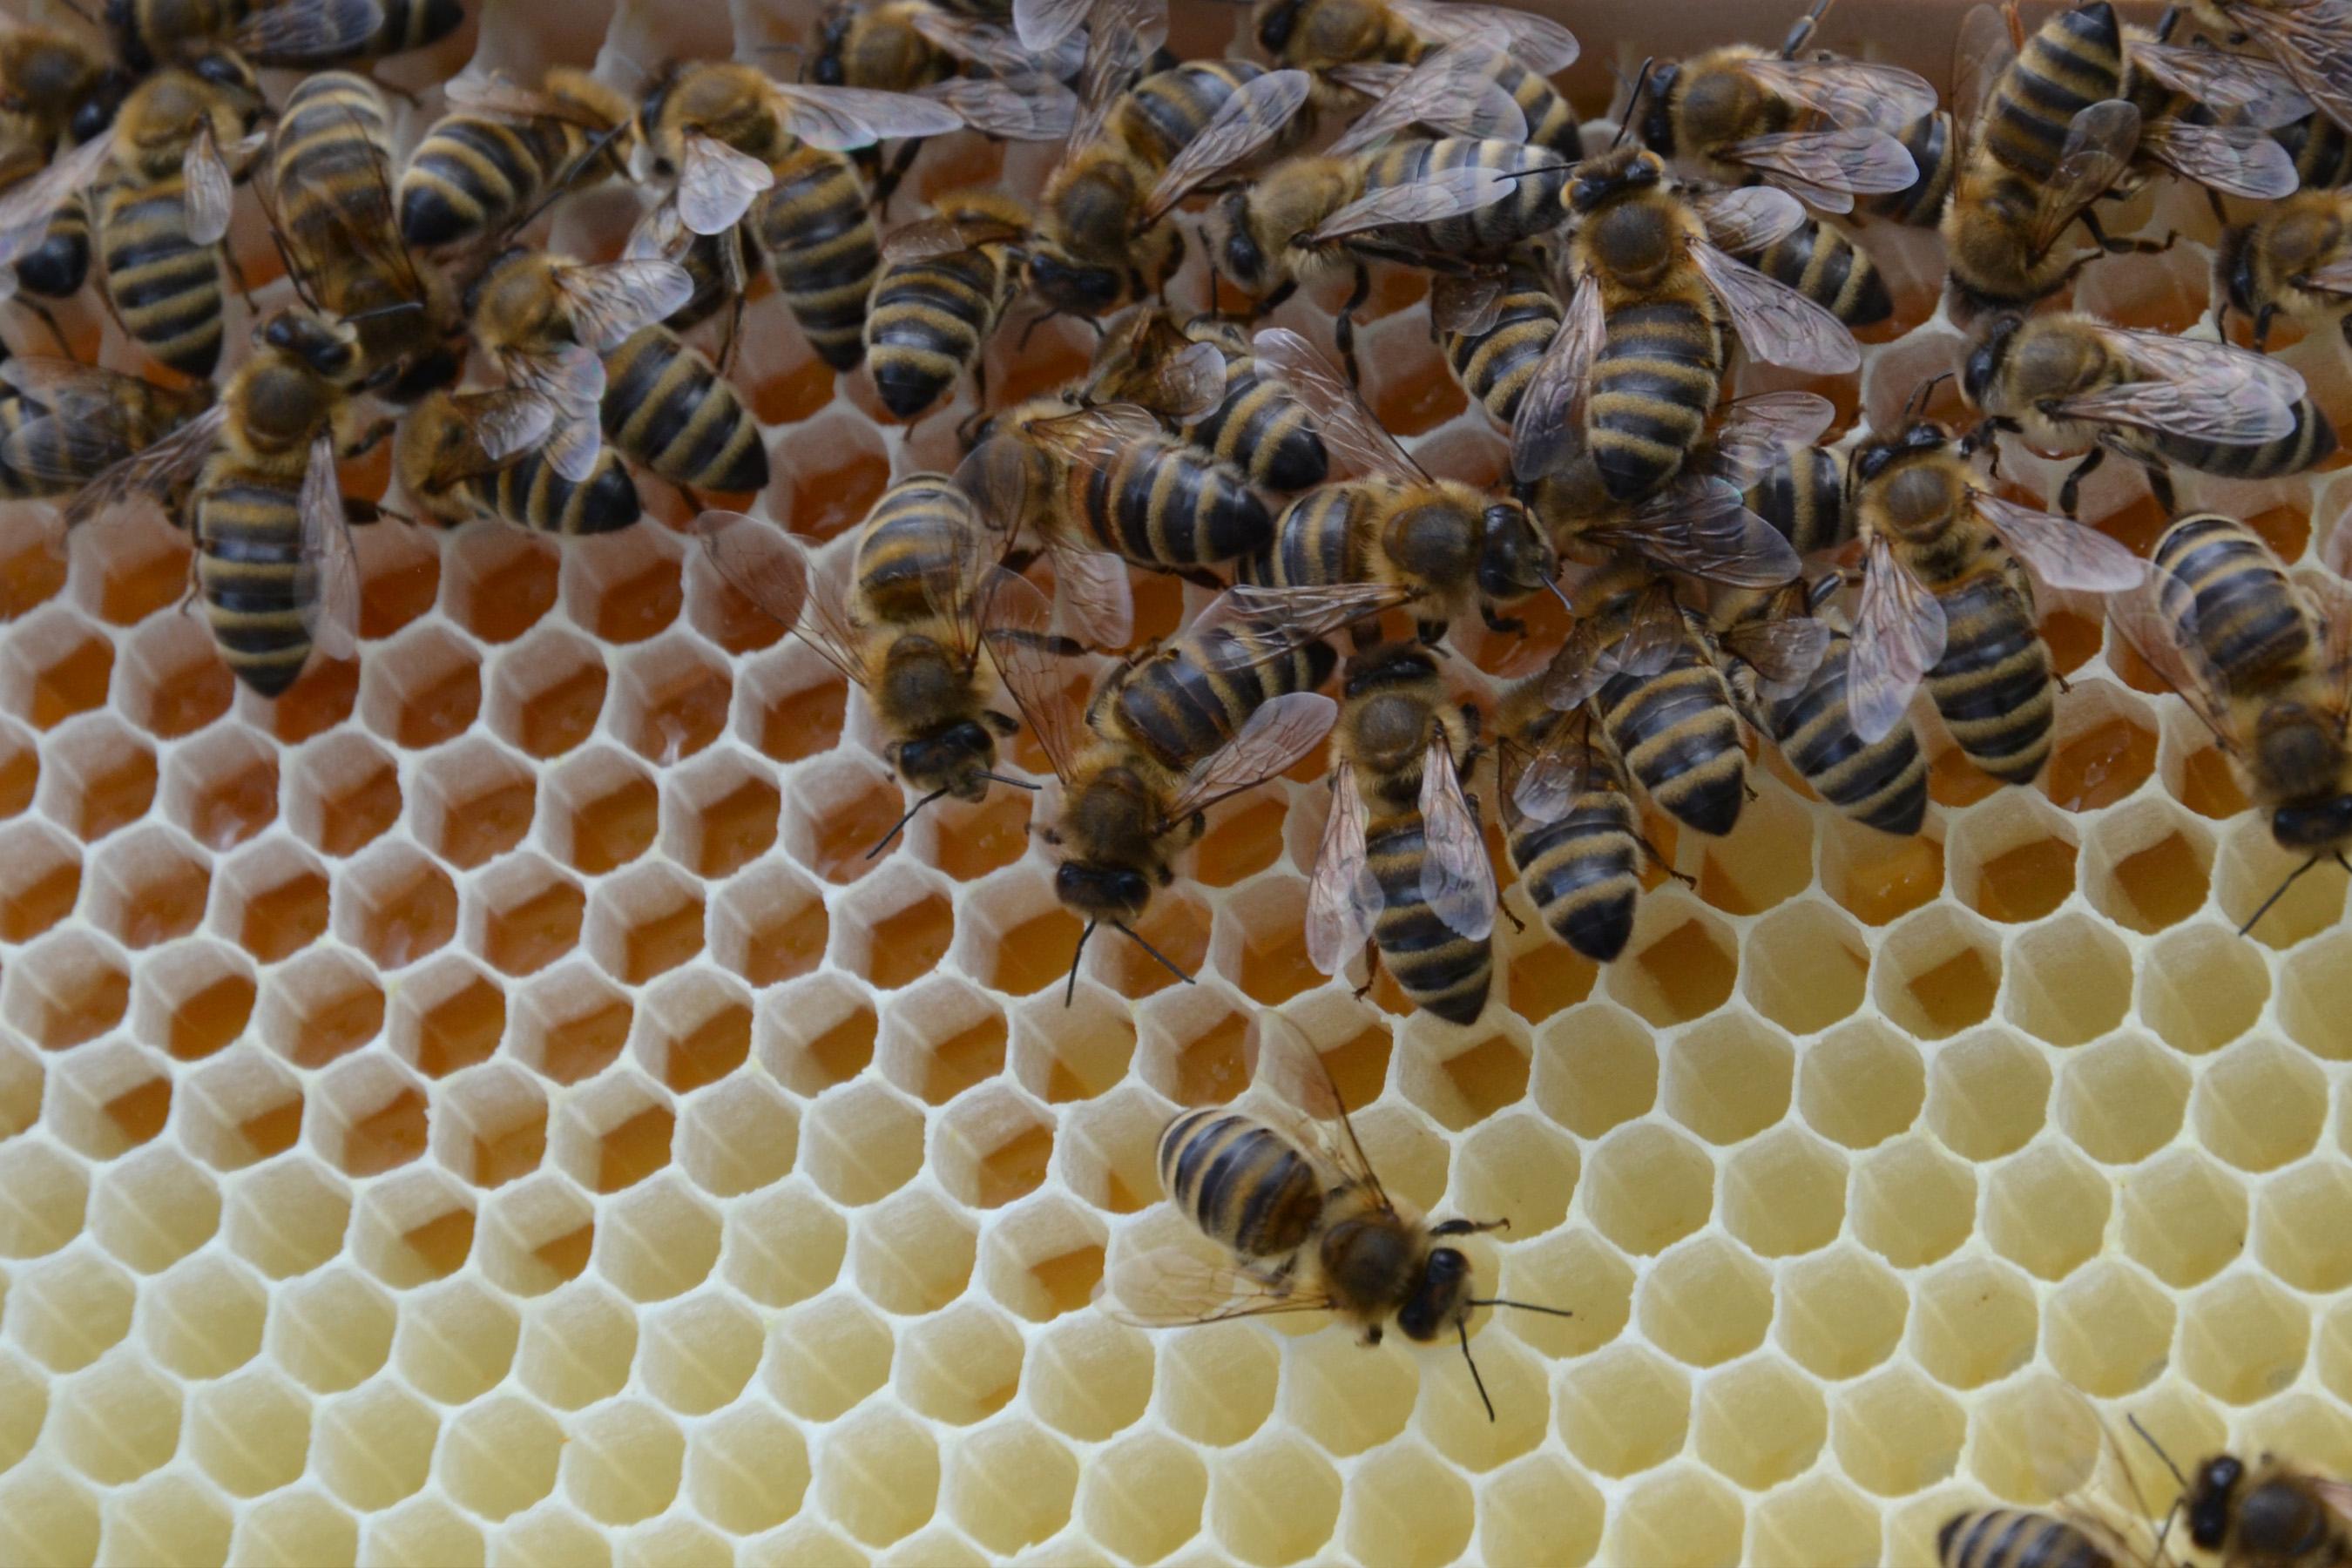 honig.bienen machen bienen.honig